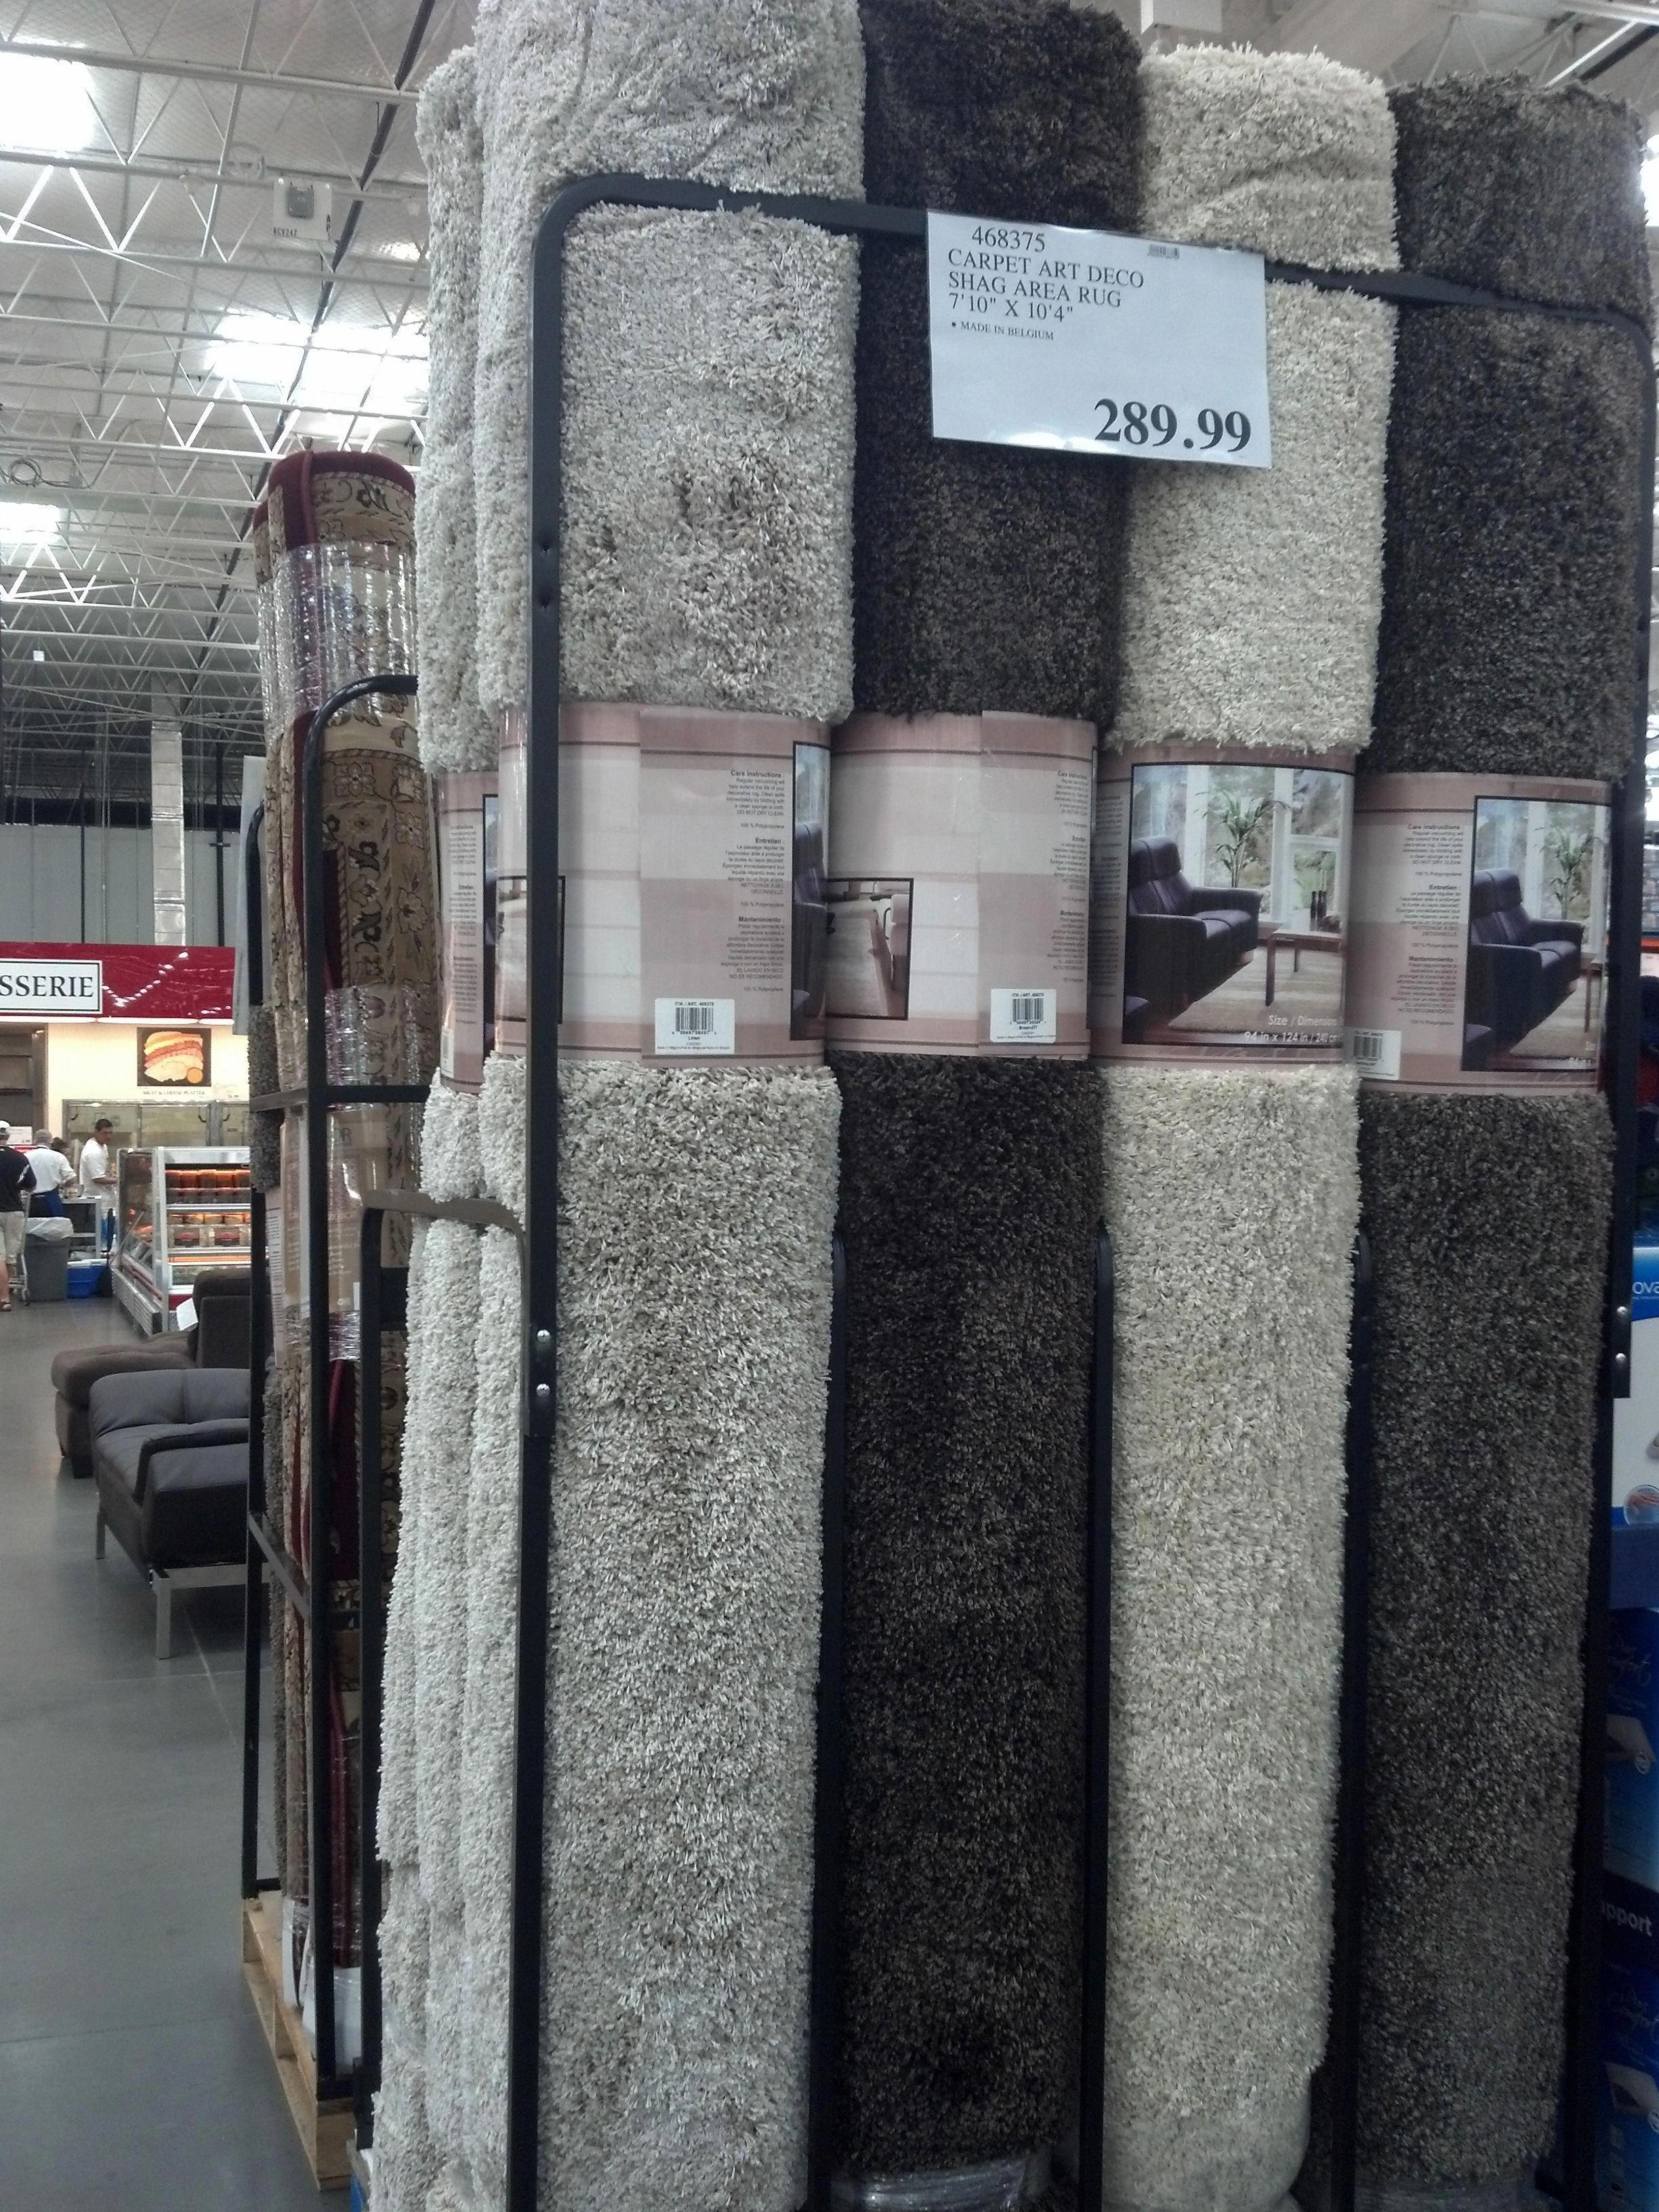 Costco Love This Shag Rug Carpetsremnantsforsale Carpetsstoresnearme Rugs On Carpet Buying Carpet Carpet Sale